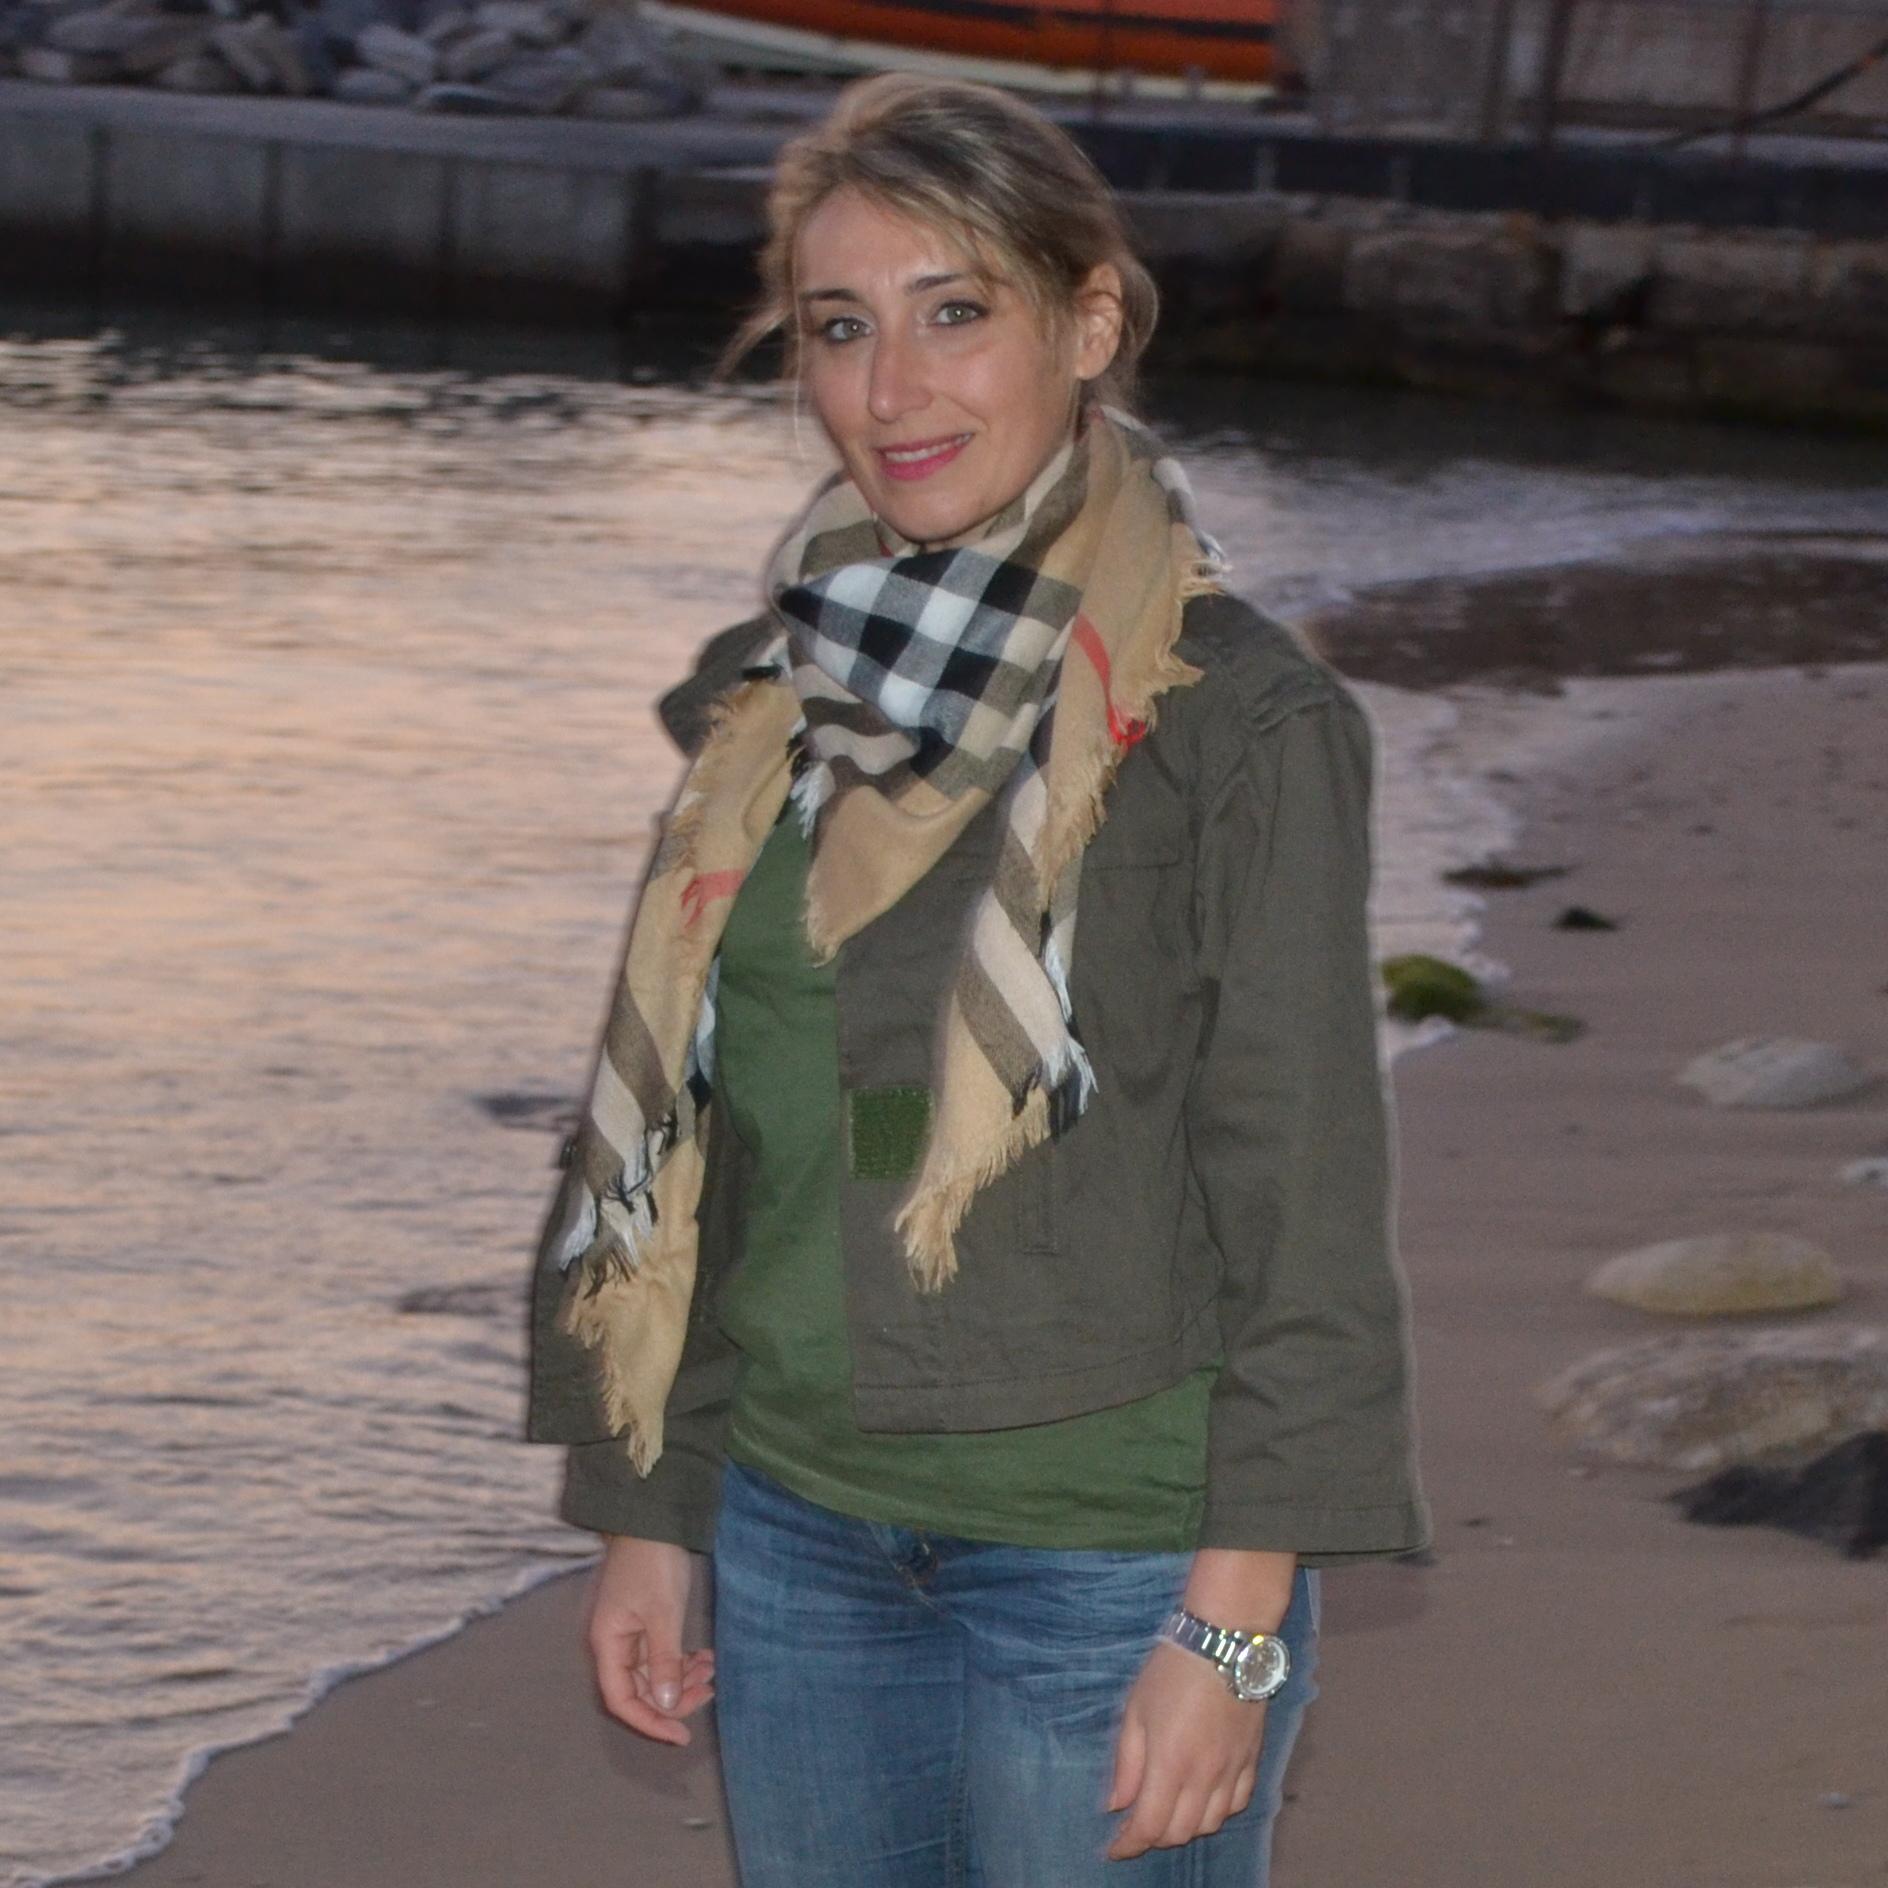 Veronica Leotta